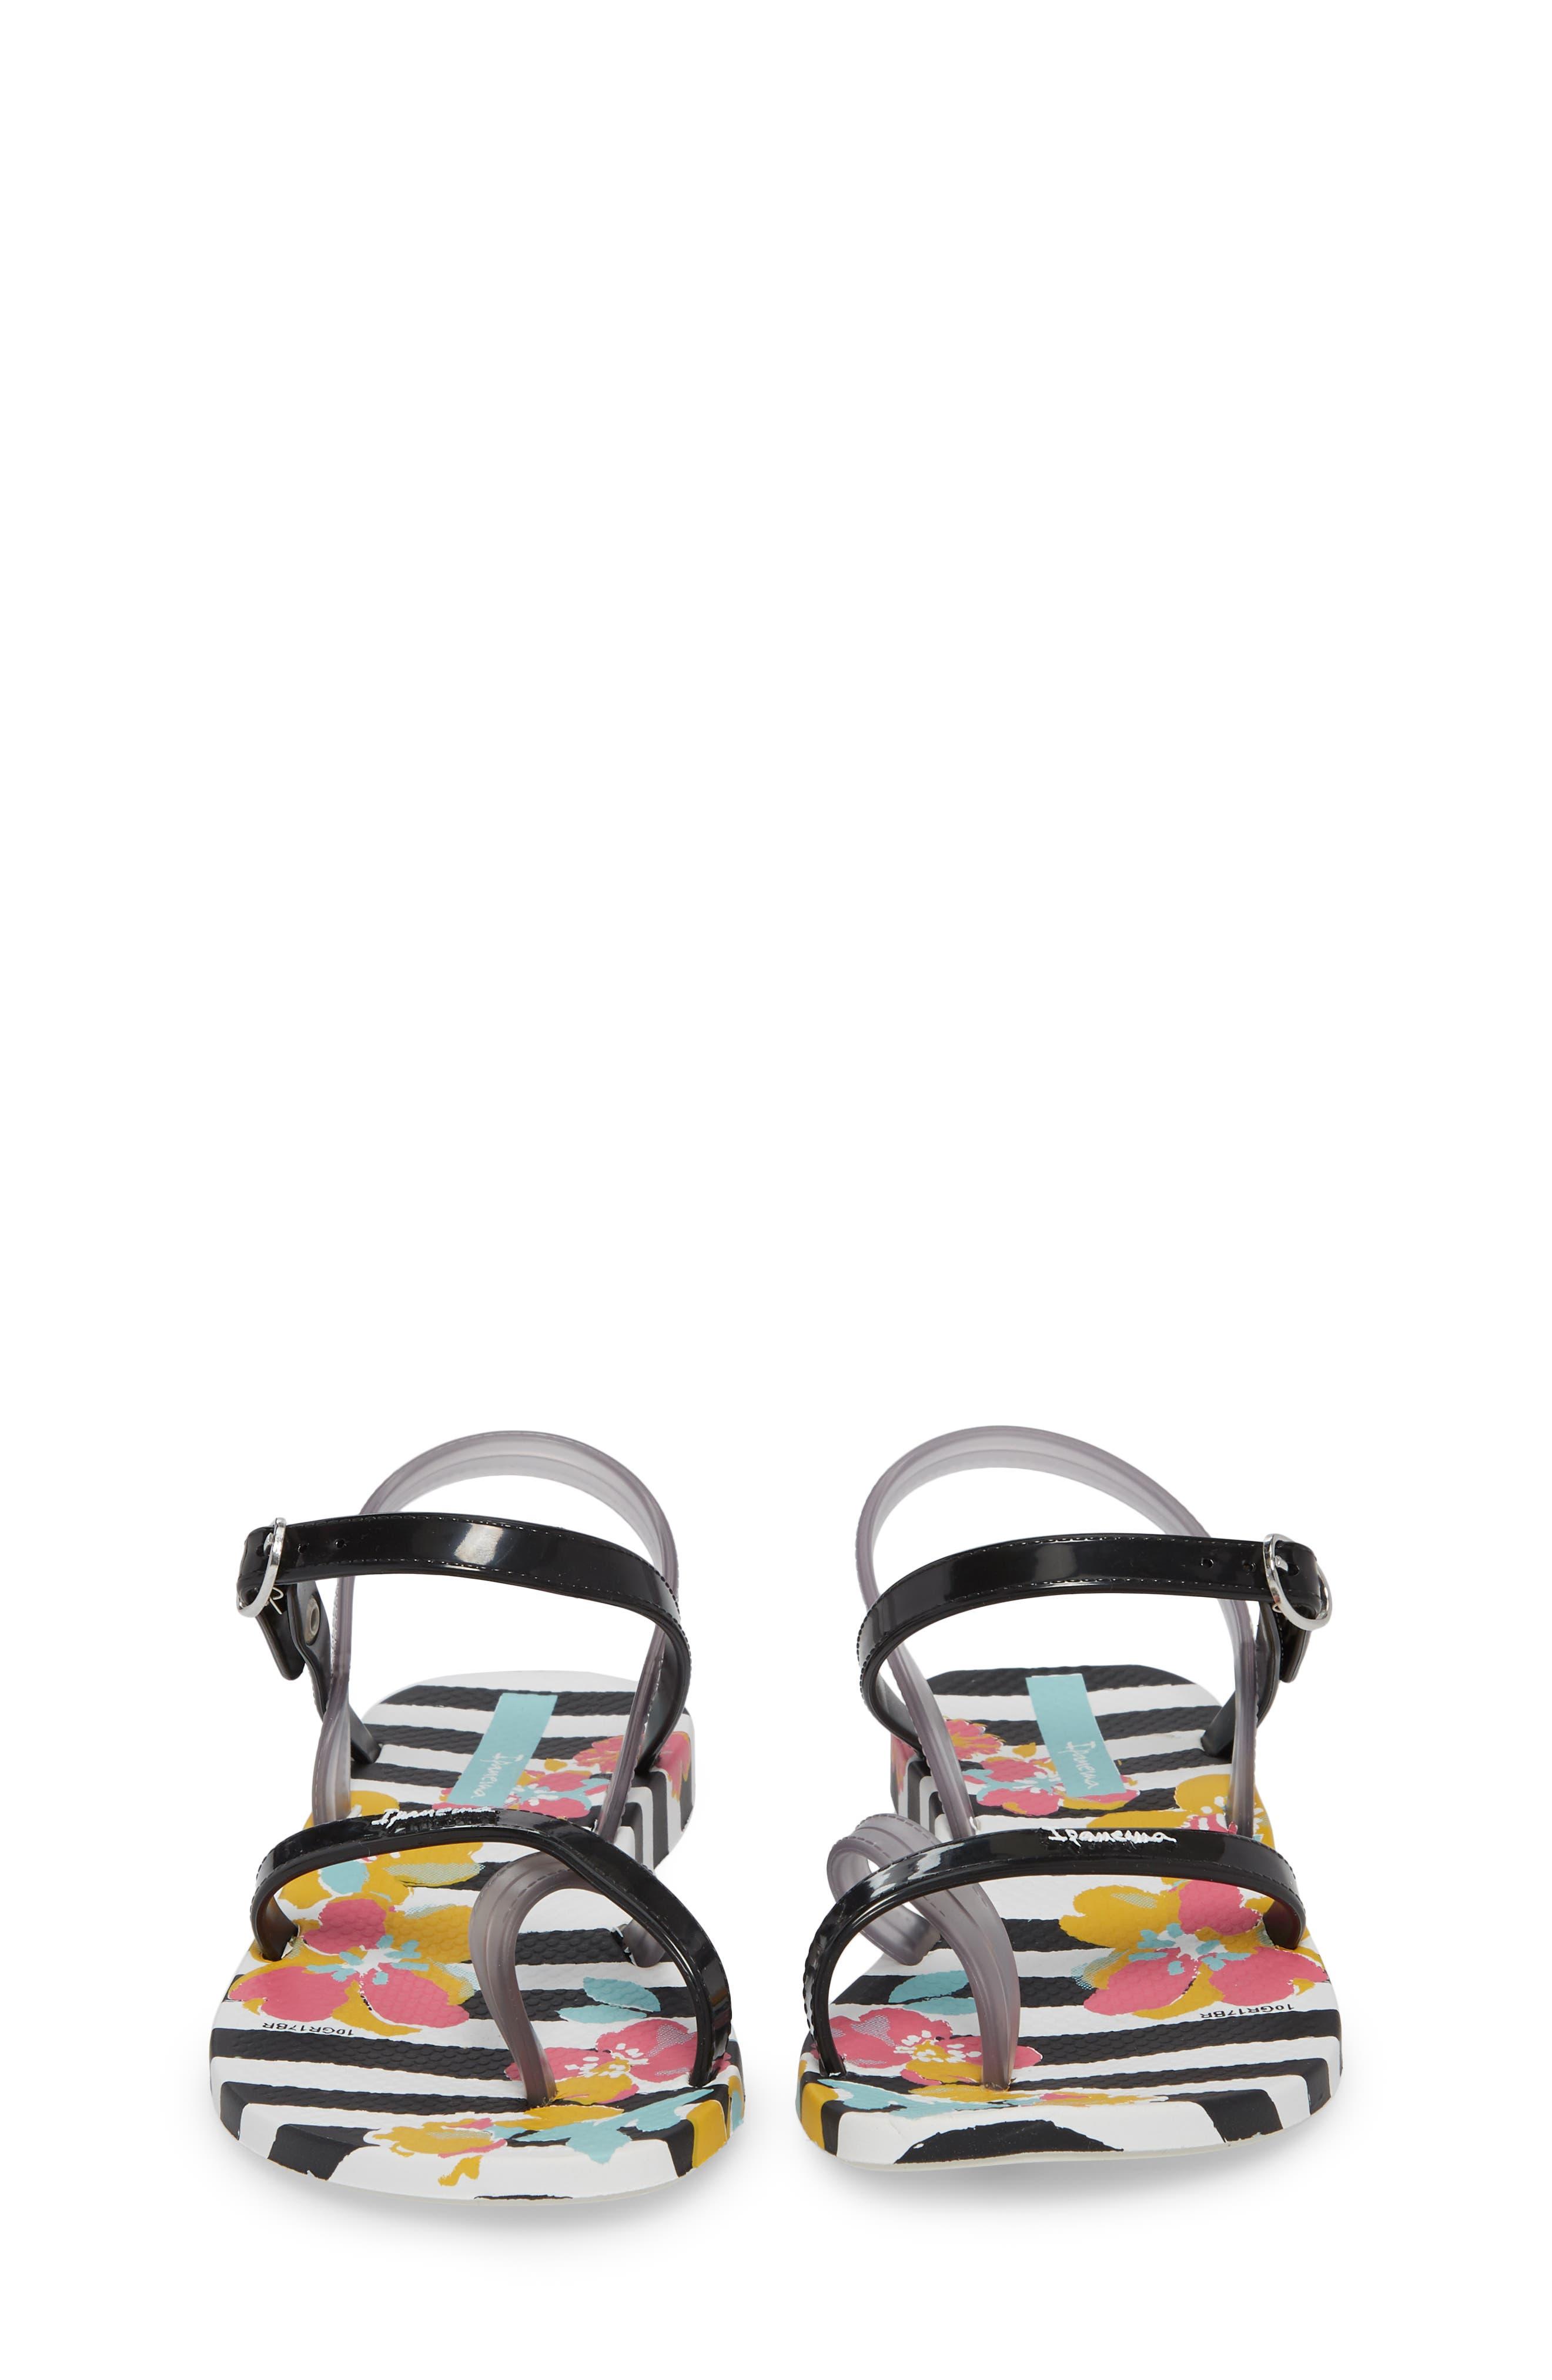 Toe Loop Sandal,                             Alternate thumbnail 5, color,                             White/ Black